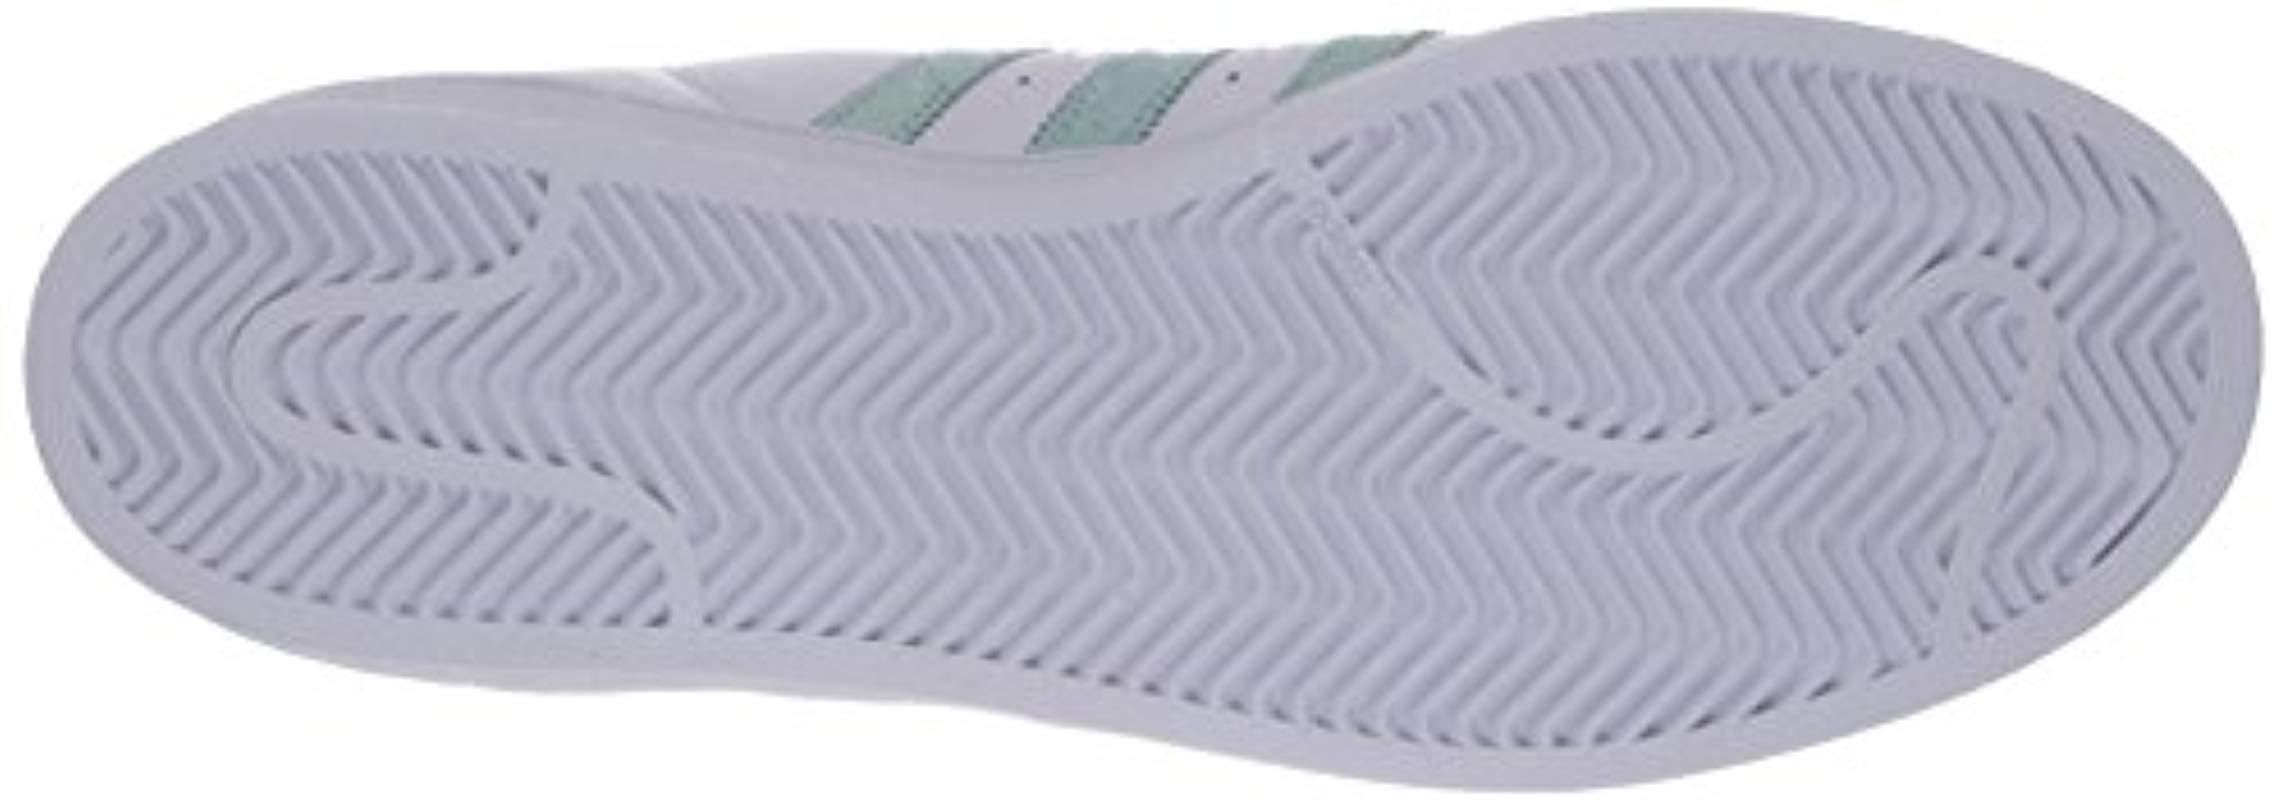 0ce54d2352c Lyst - adidas Originals Superstar W Sneaker